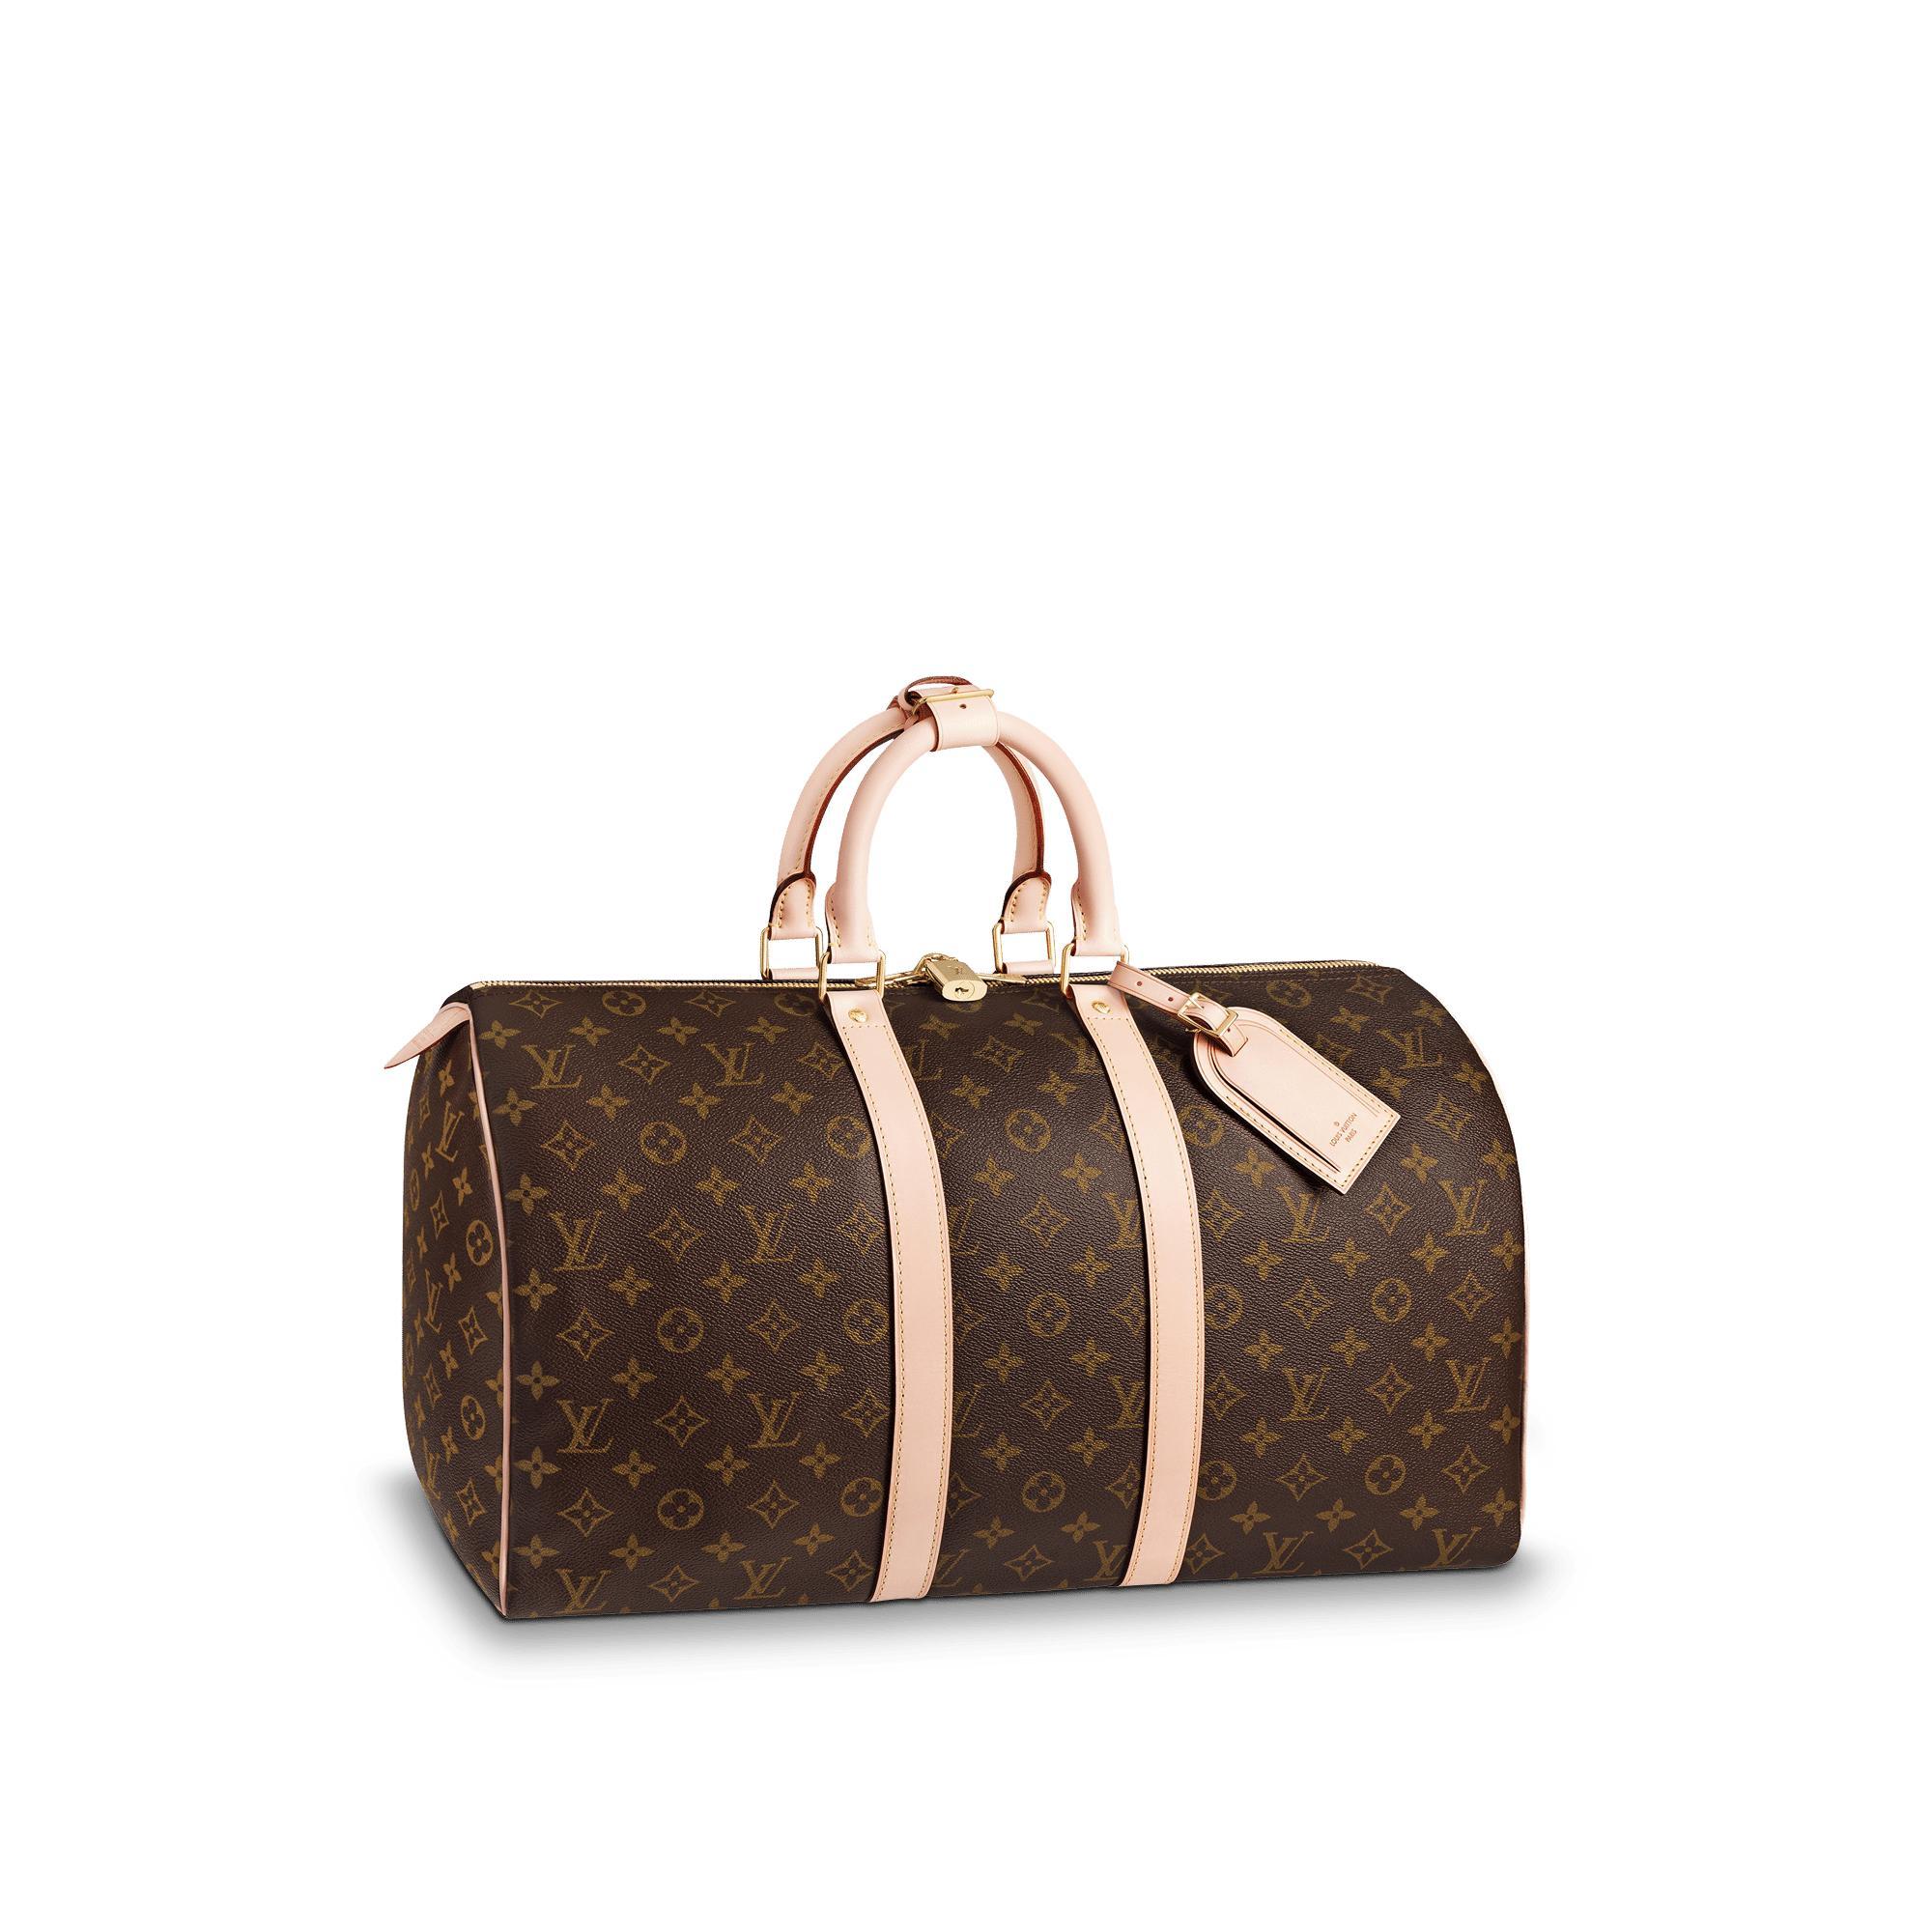 f6ebcd318e72 Louis Vuitton Keepall 45